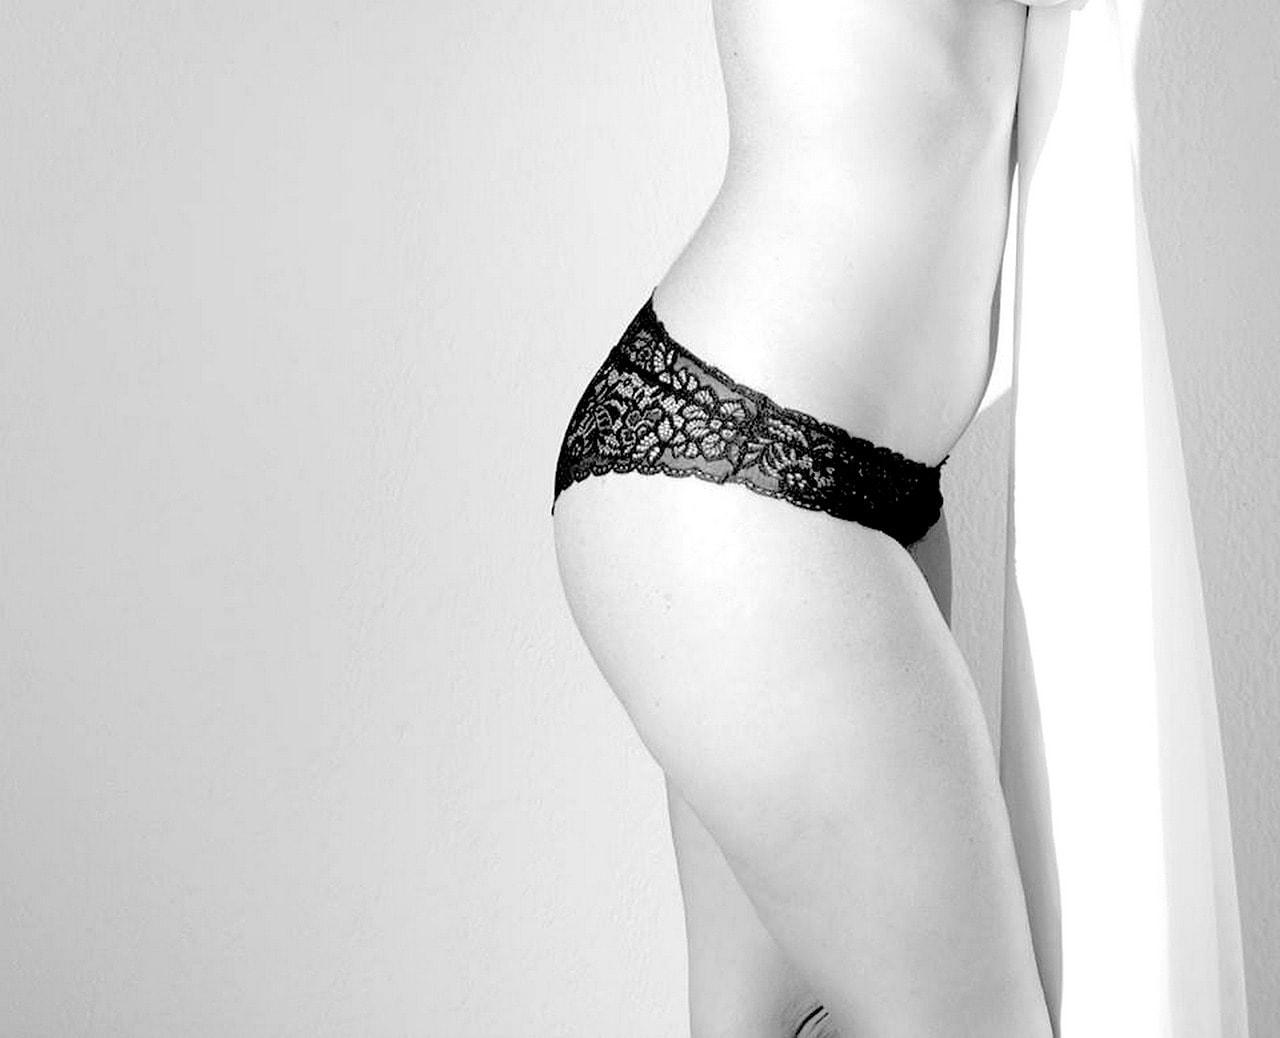 sensual-1198143_1280